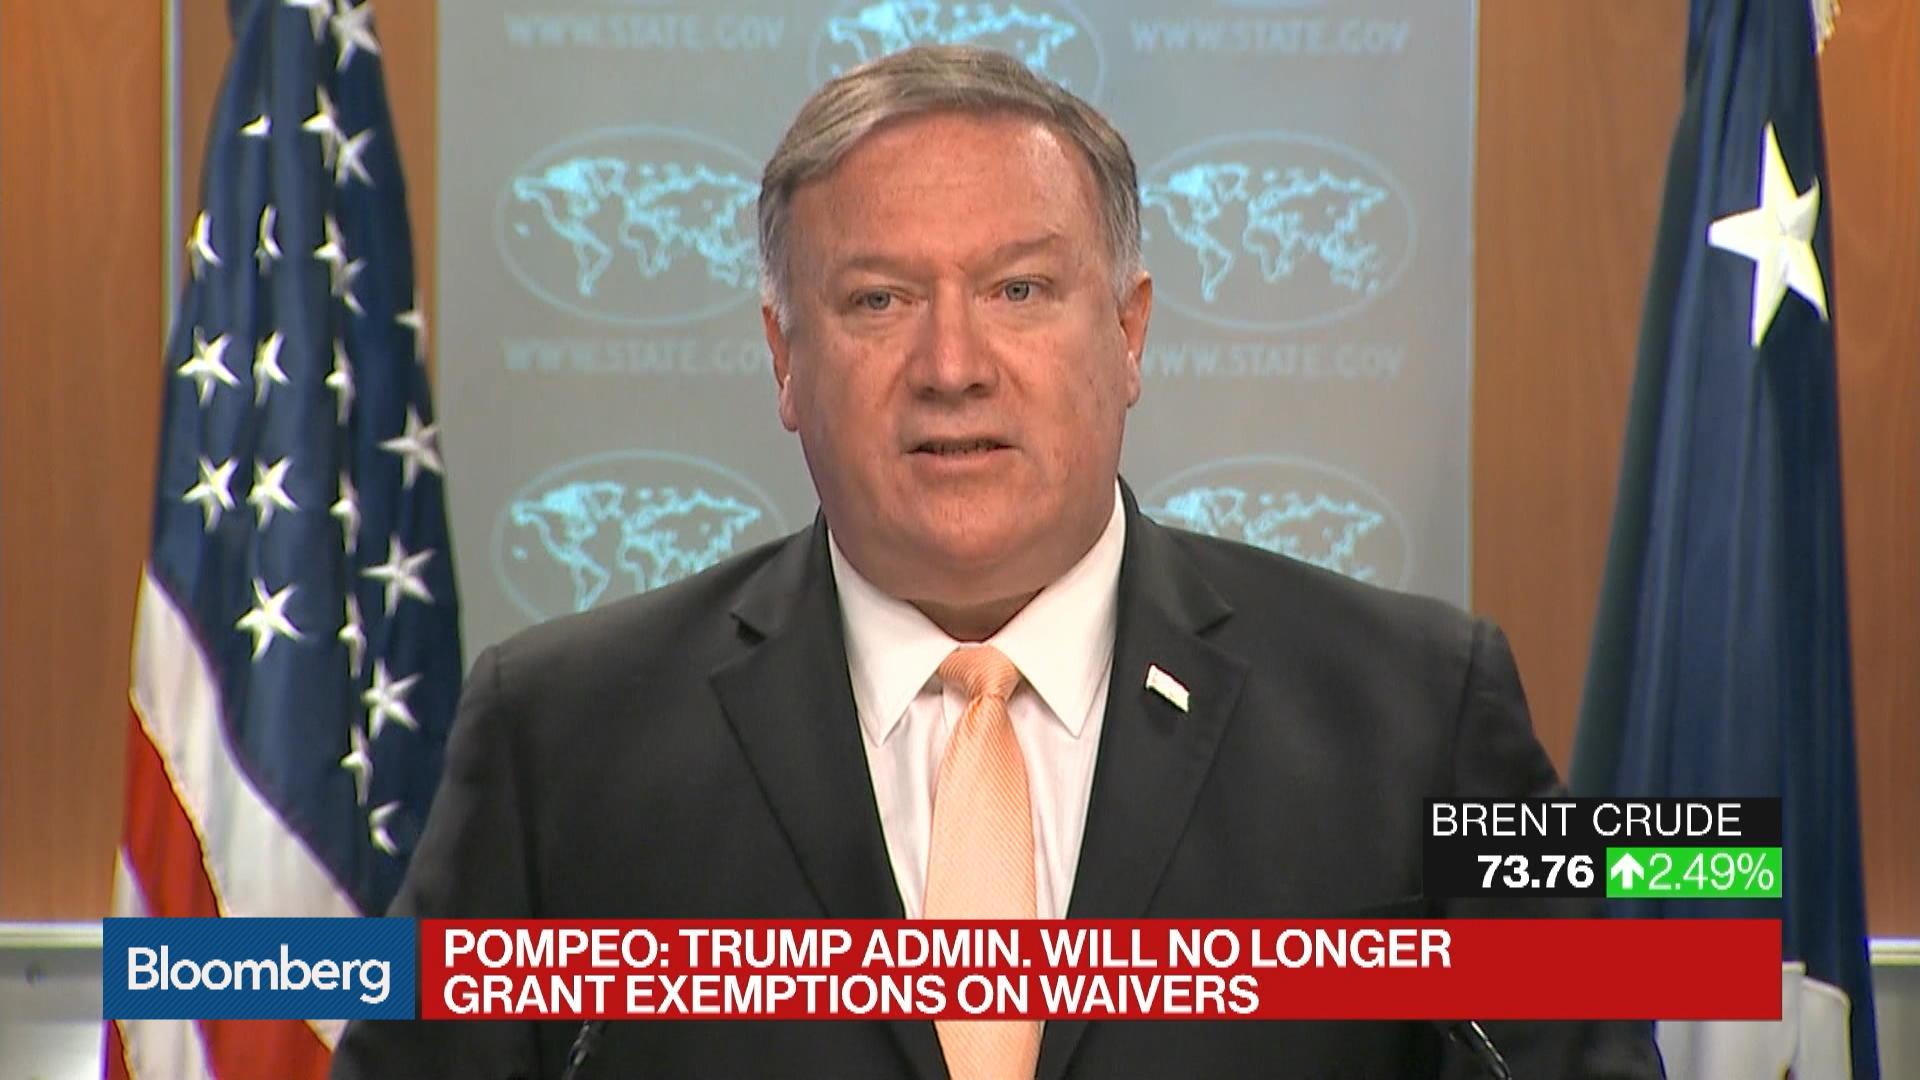 Iran Threatens to Close Strait of Hormuz in Showdown with US